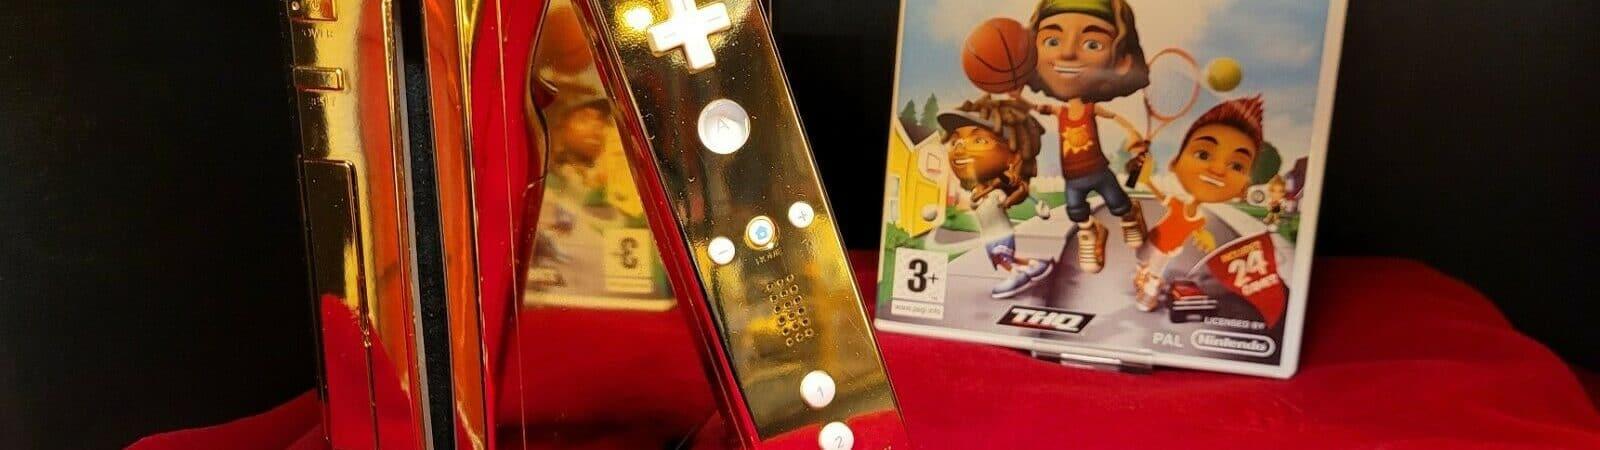 Nintendo Wii de ouro